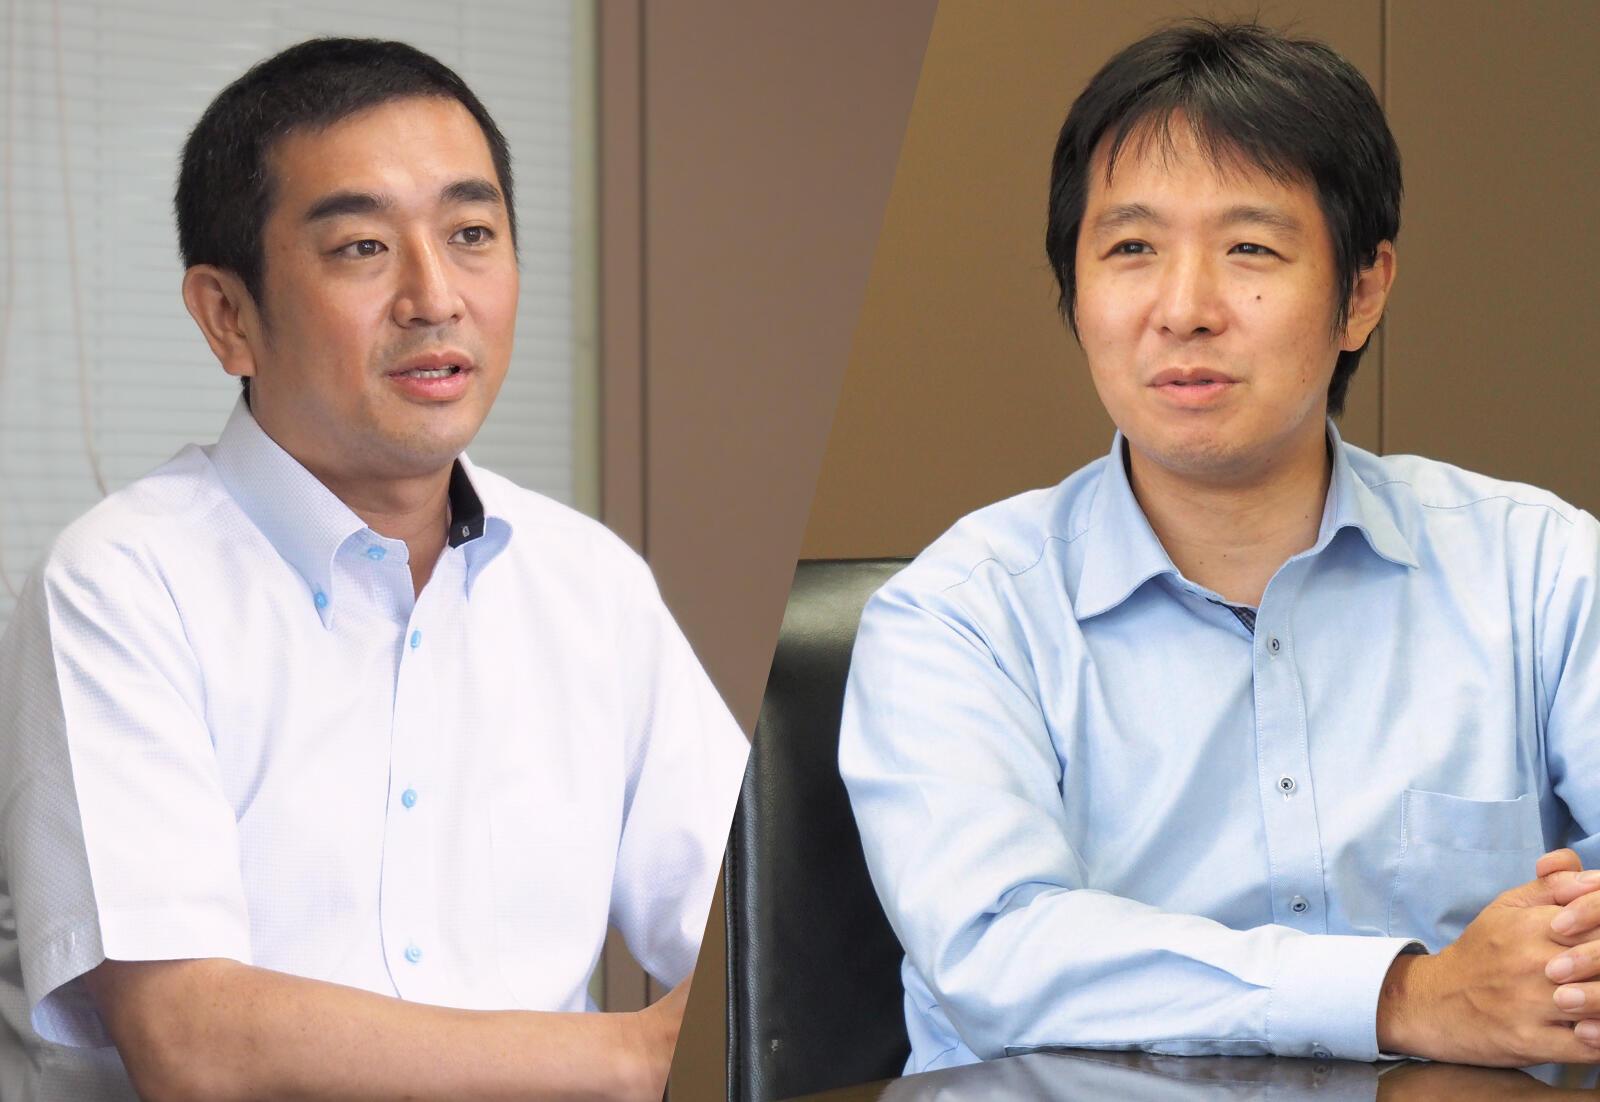 図研 高木良亮氏(左)と、図研プリサイト 倉本将光(右)